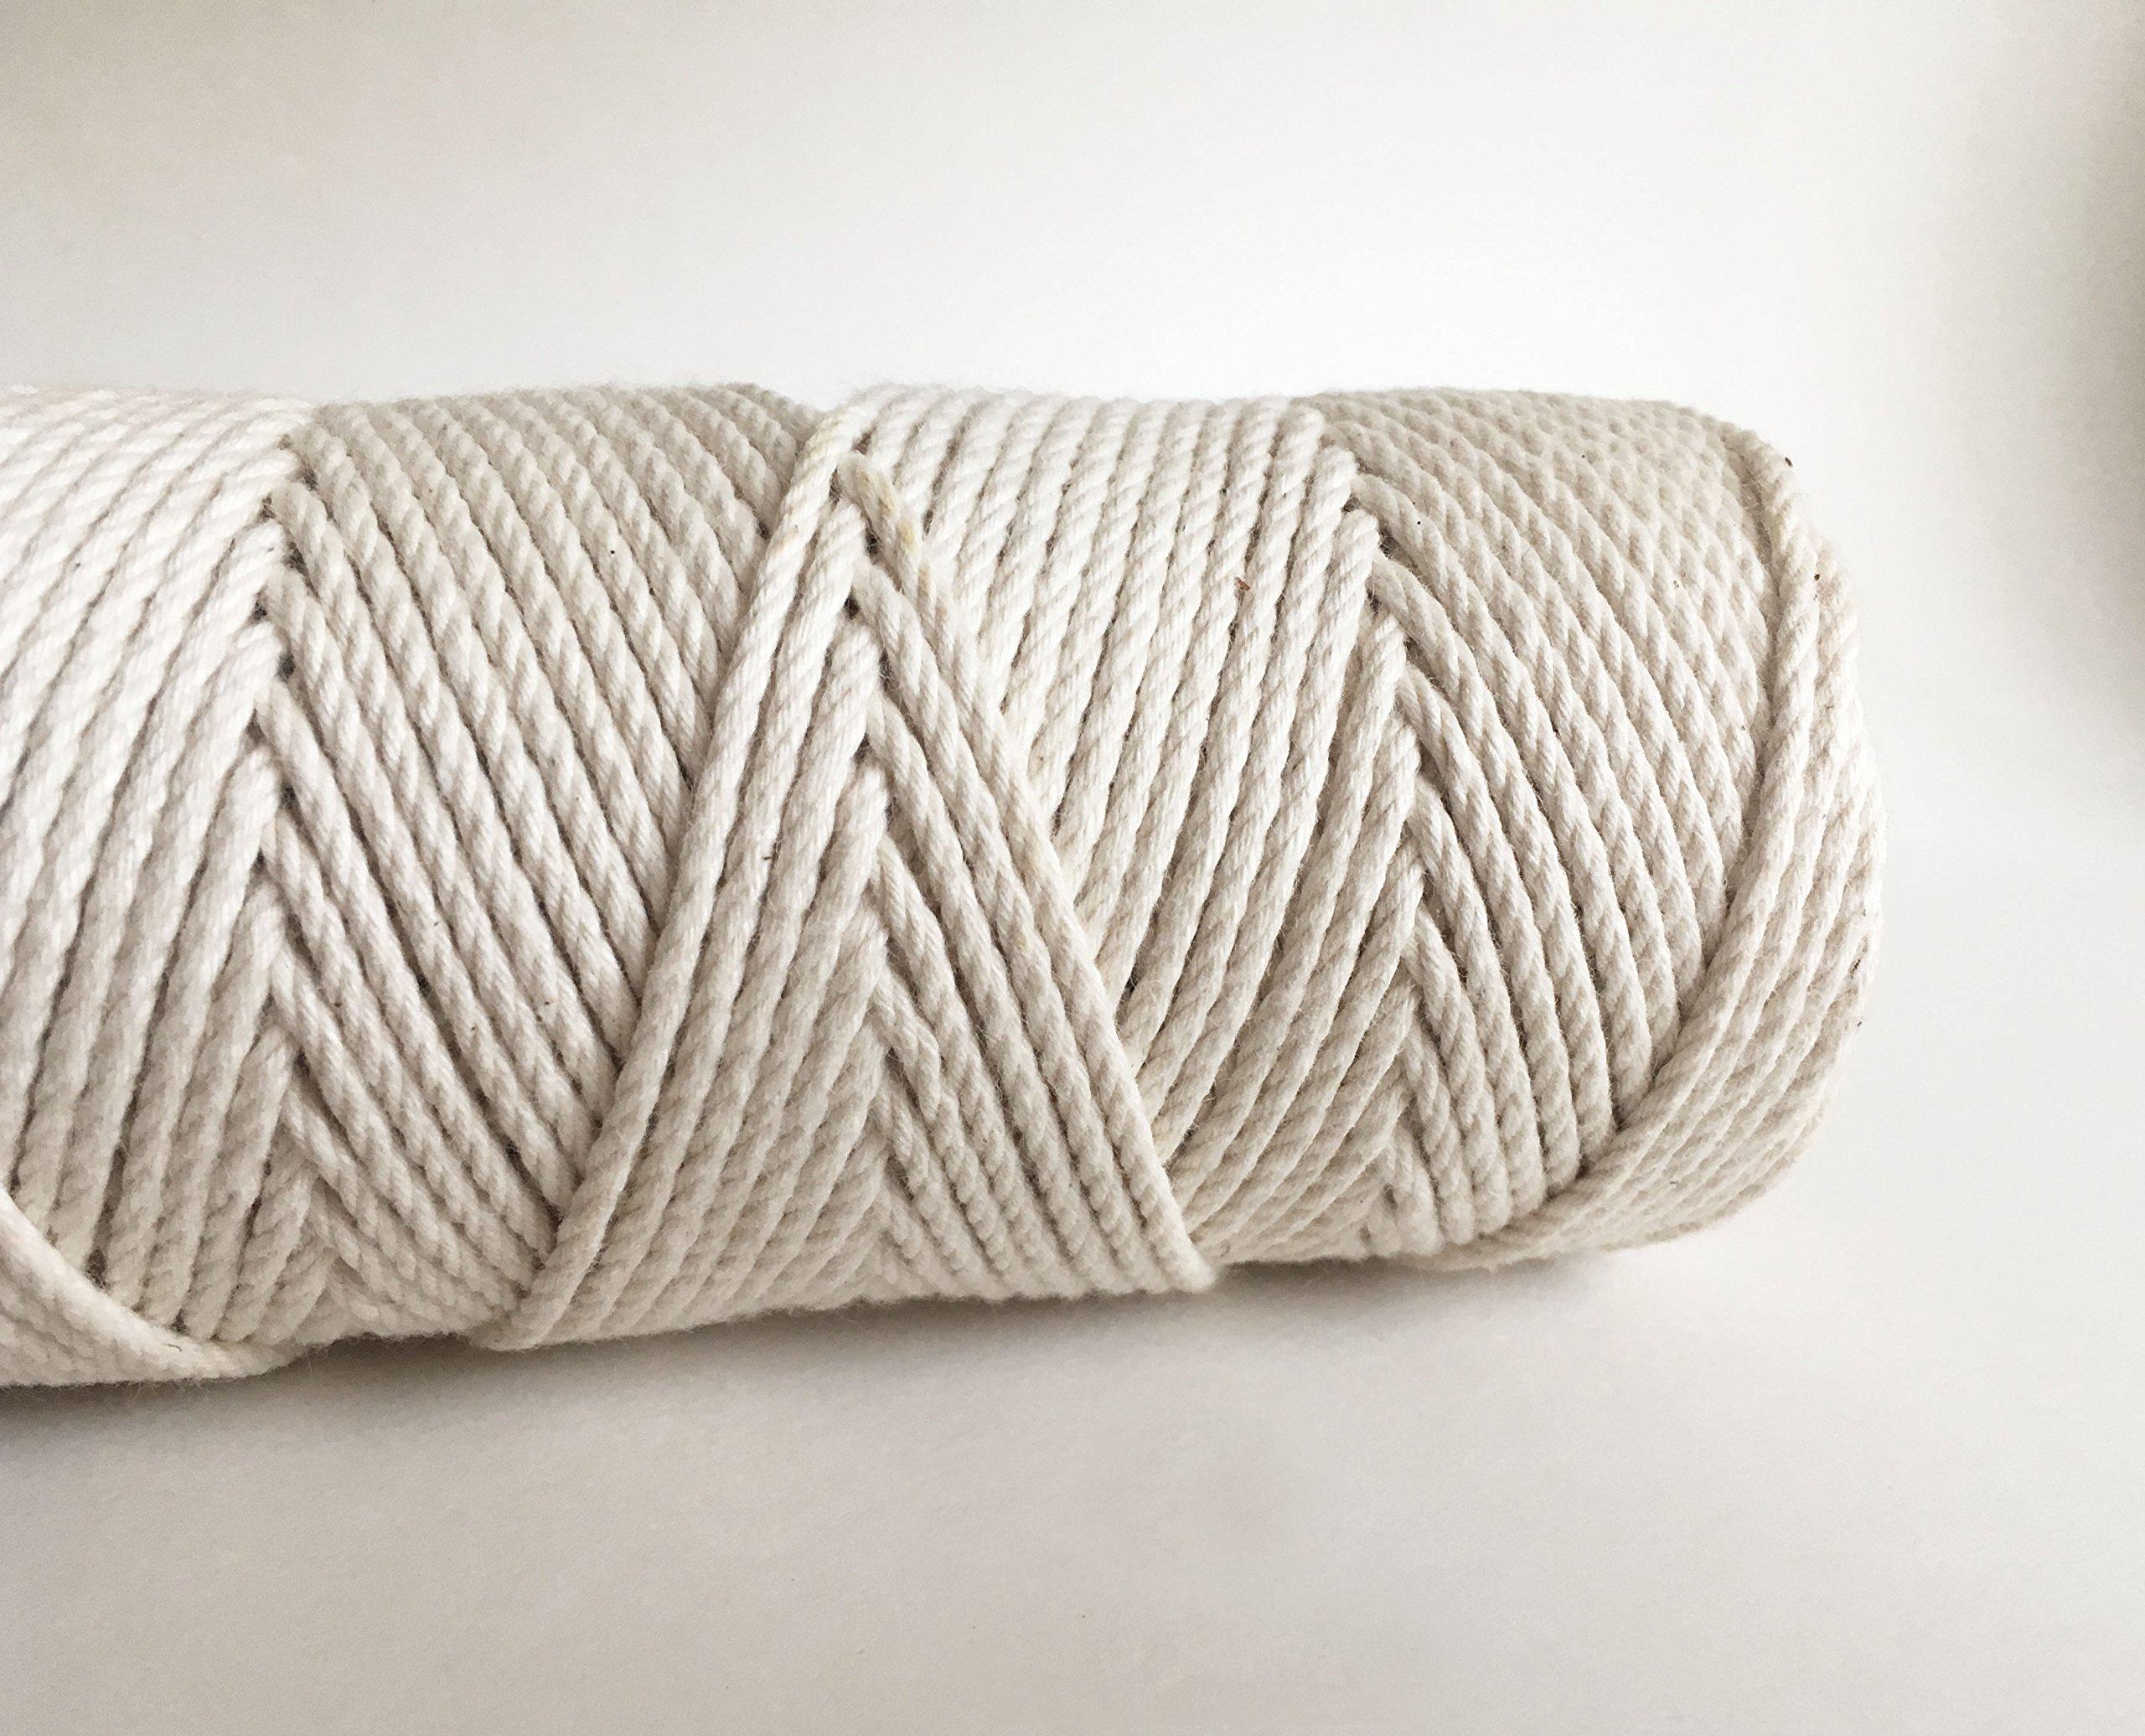 2mm Cotton Knotting Rope/3 Strand Macrame Cord